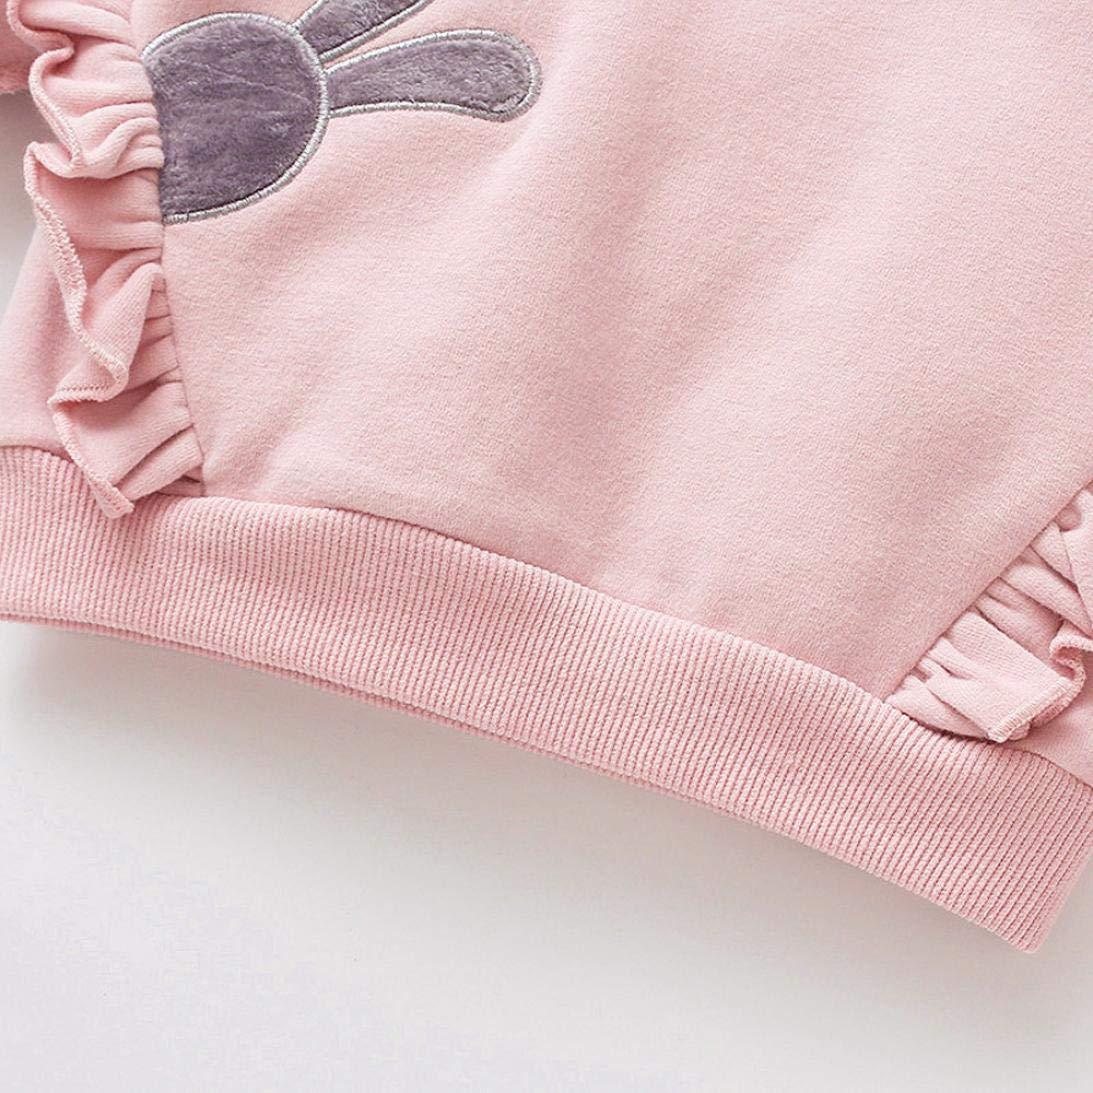 KaiCran Toddler Baby Girls Tops Long Sleeve Cartoon Radish Sweatshirt Outfits Rabbit Print 0-24 Months